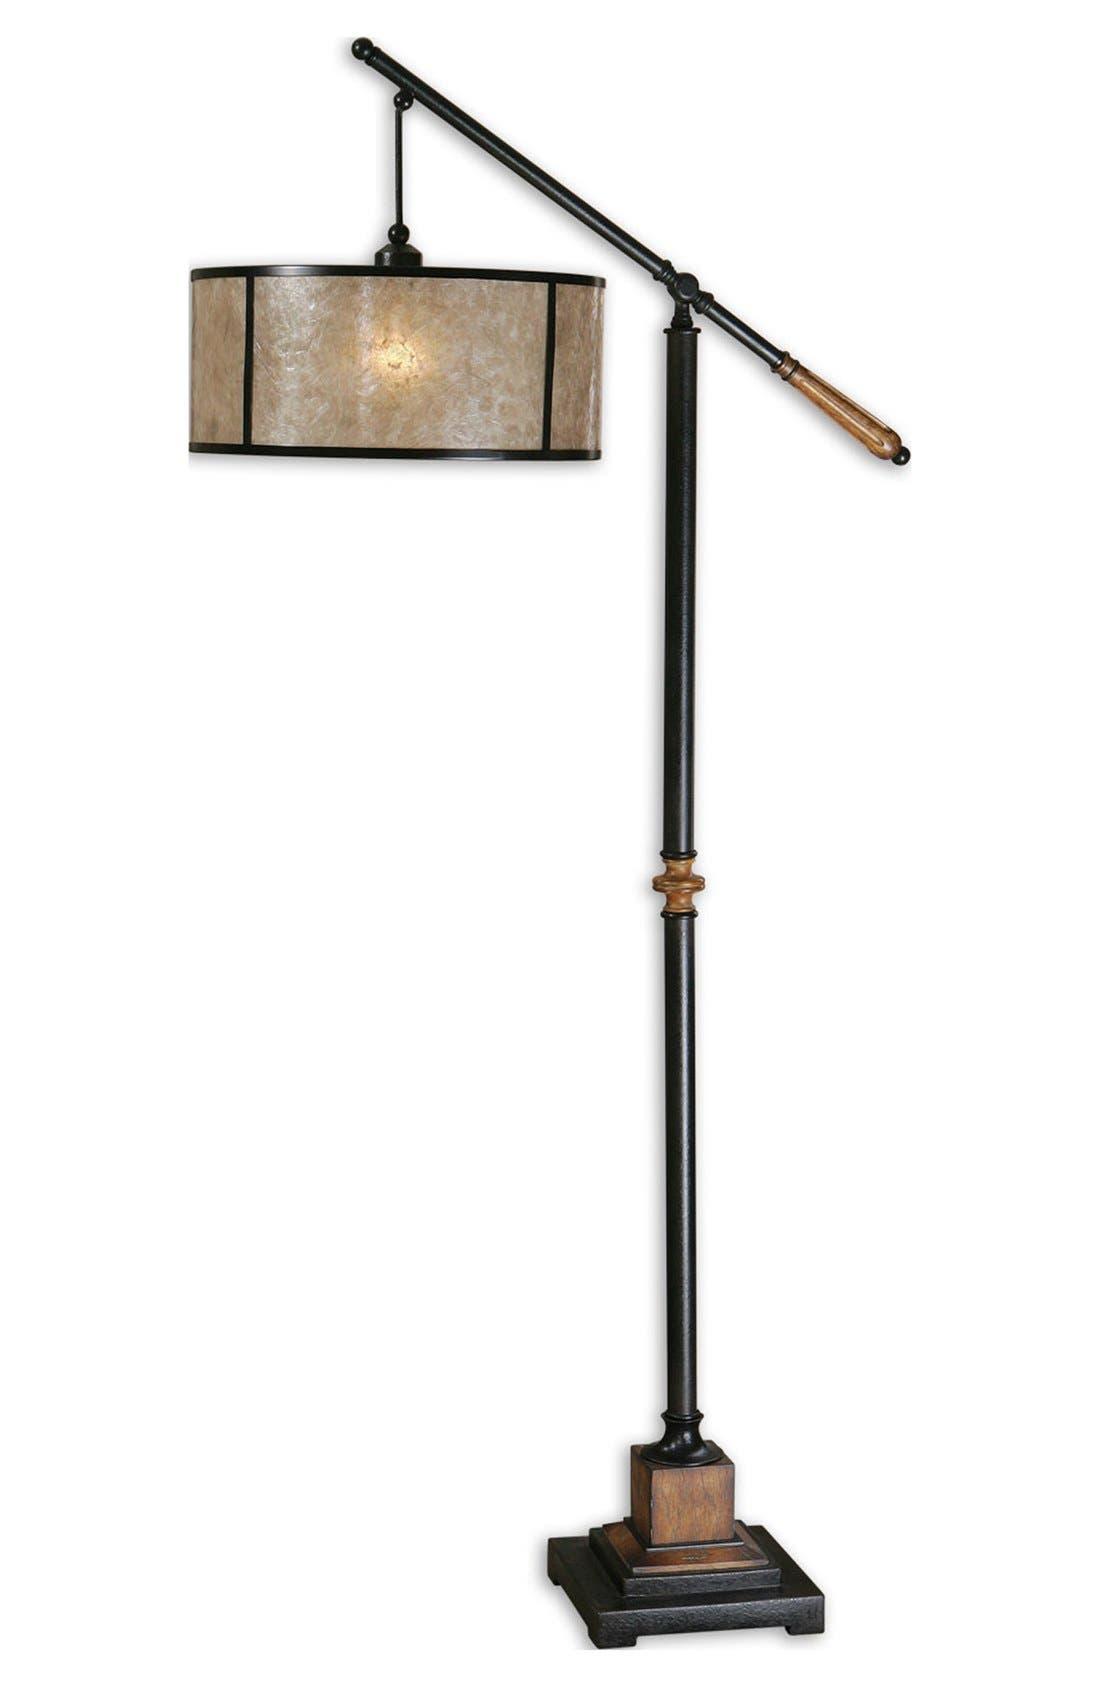 Uttermost 'Sitka' Lantern Floor Lamp